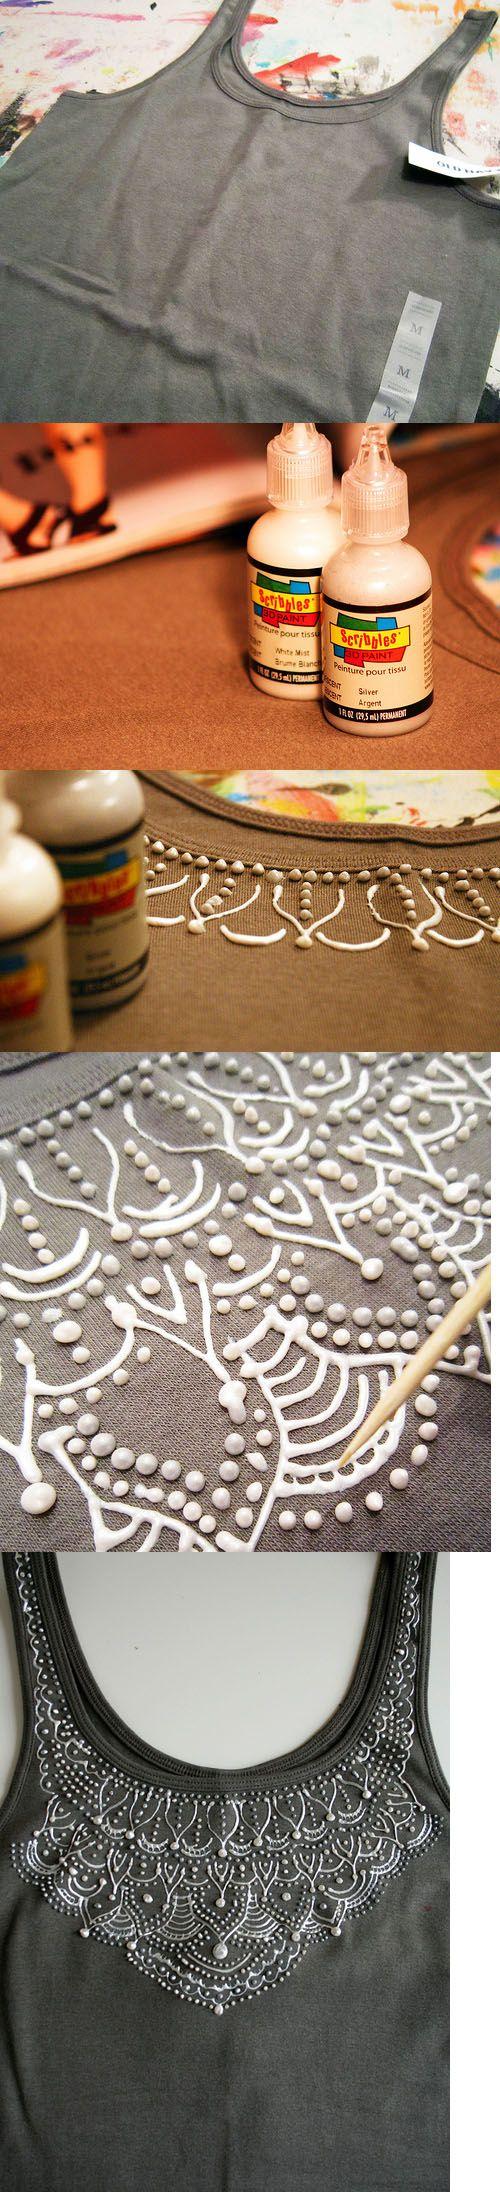 DIY henna mehndi design tank top